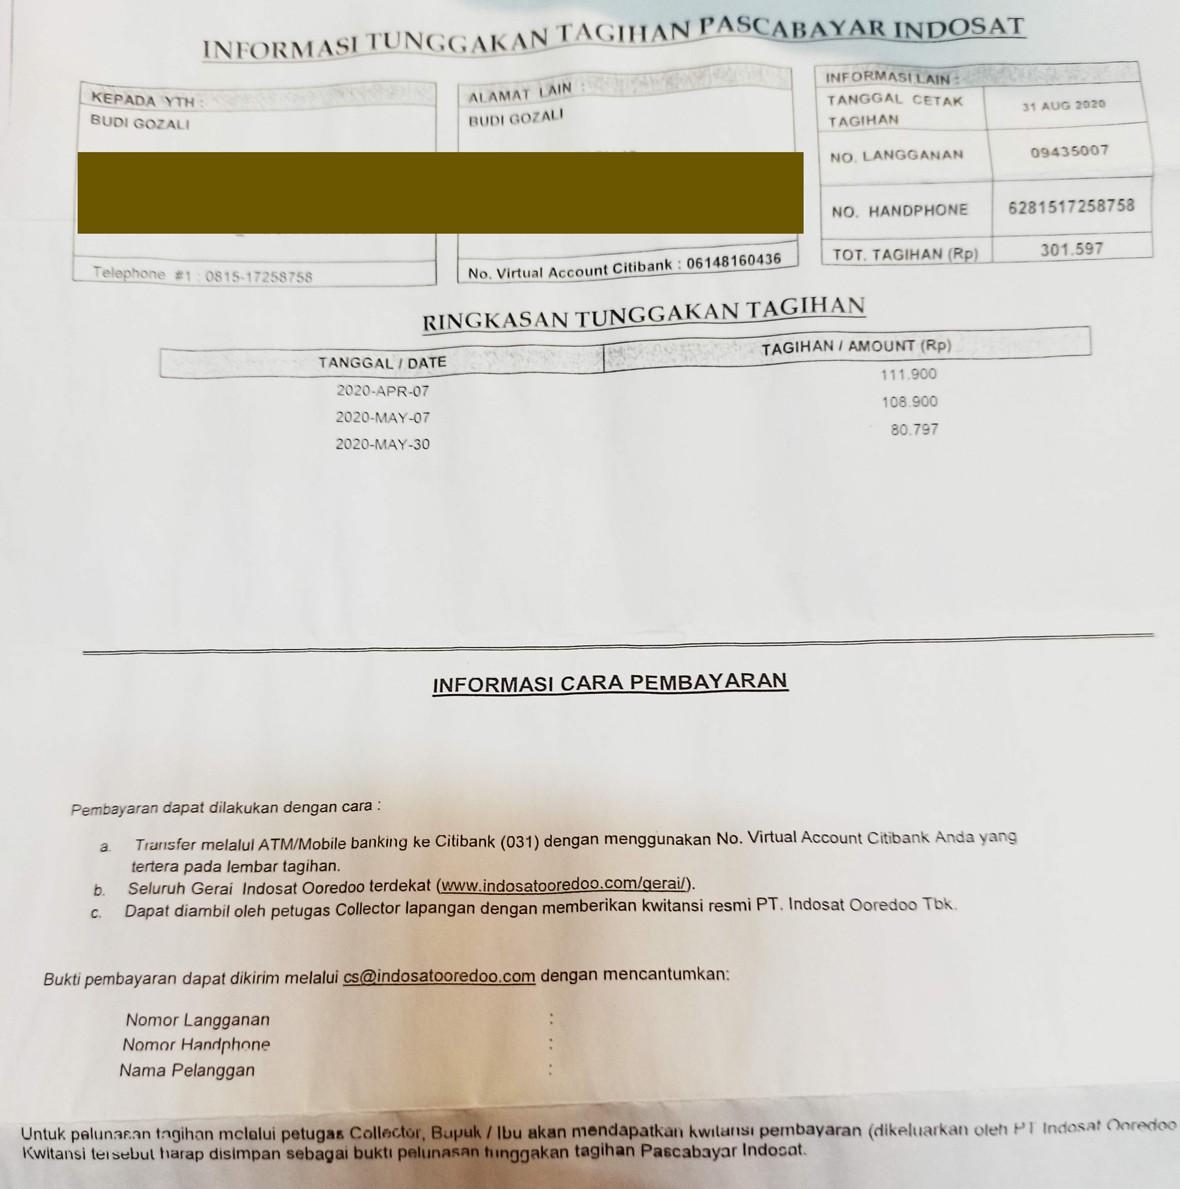 Surat Tagihan Indosat